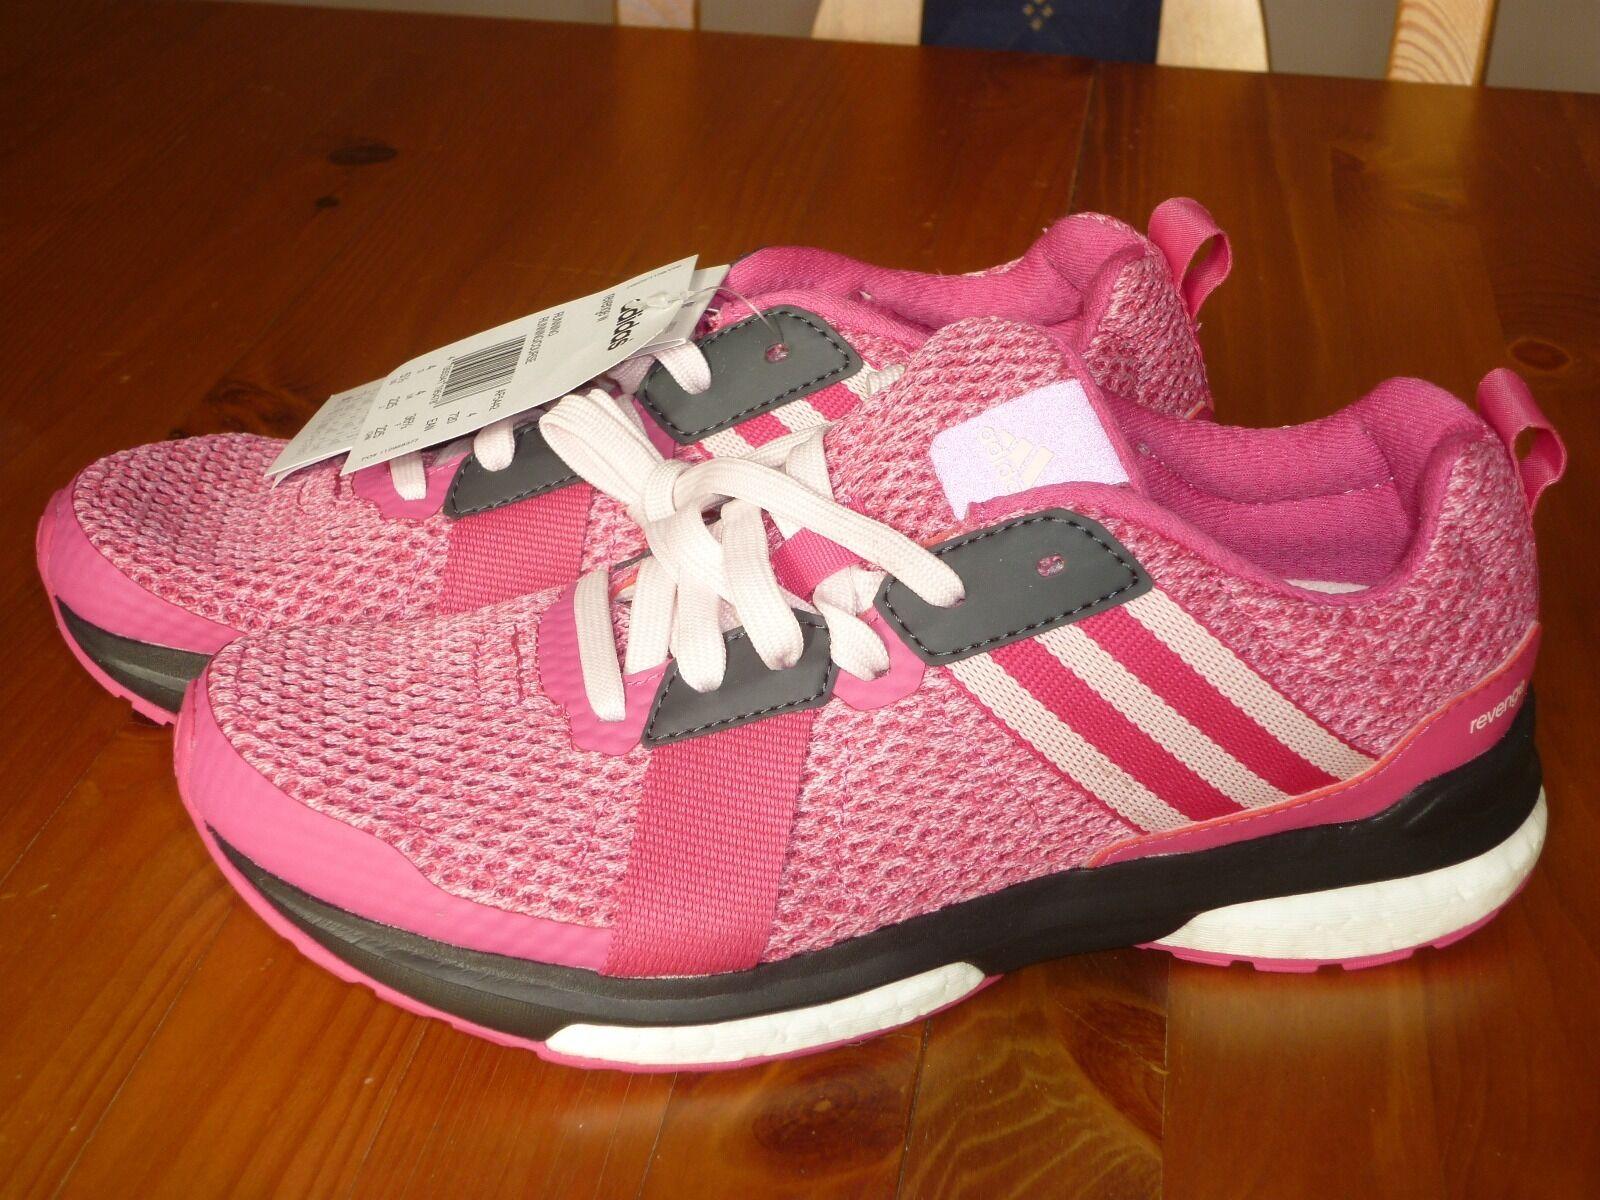 ADIDAS REVENGE Damenschuhe RUNNING 2/3 TRAINERS SIZE 4 EUR 36 2/3 RUNNING BNWT 51f2ff